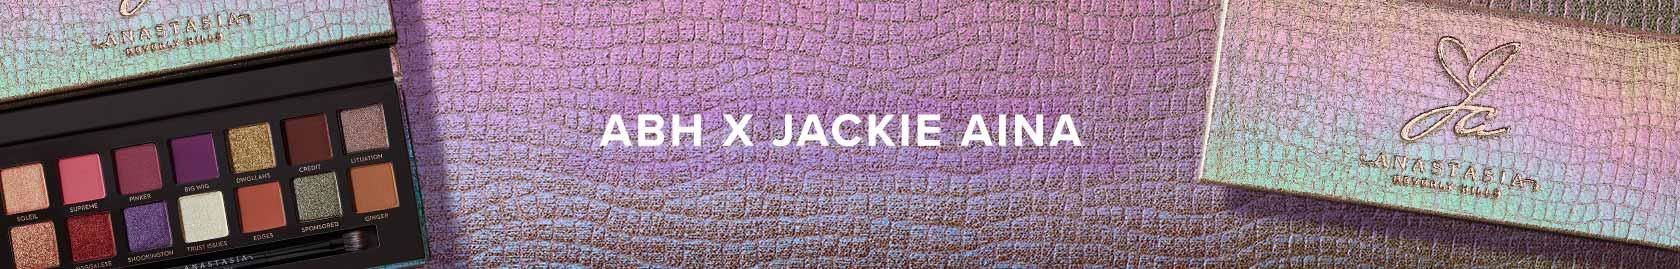 ABH x Jackie Aina Palette